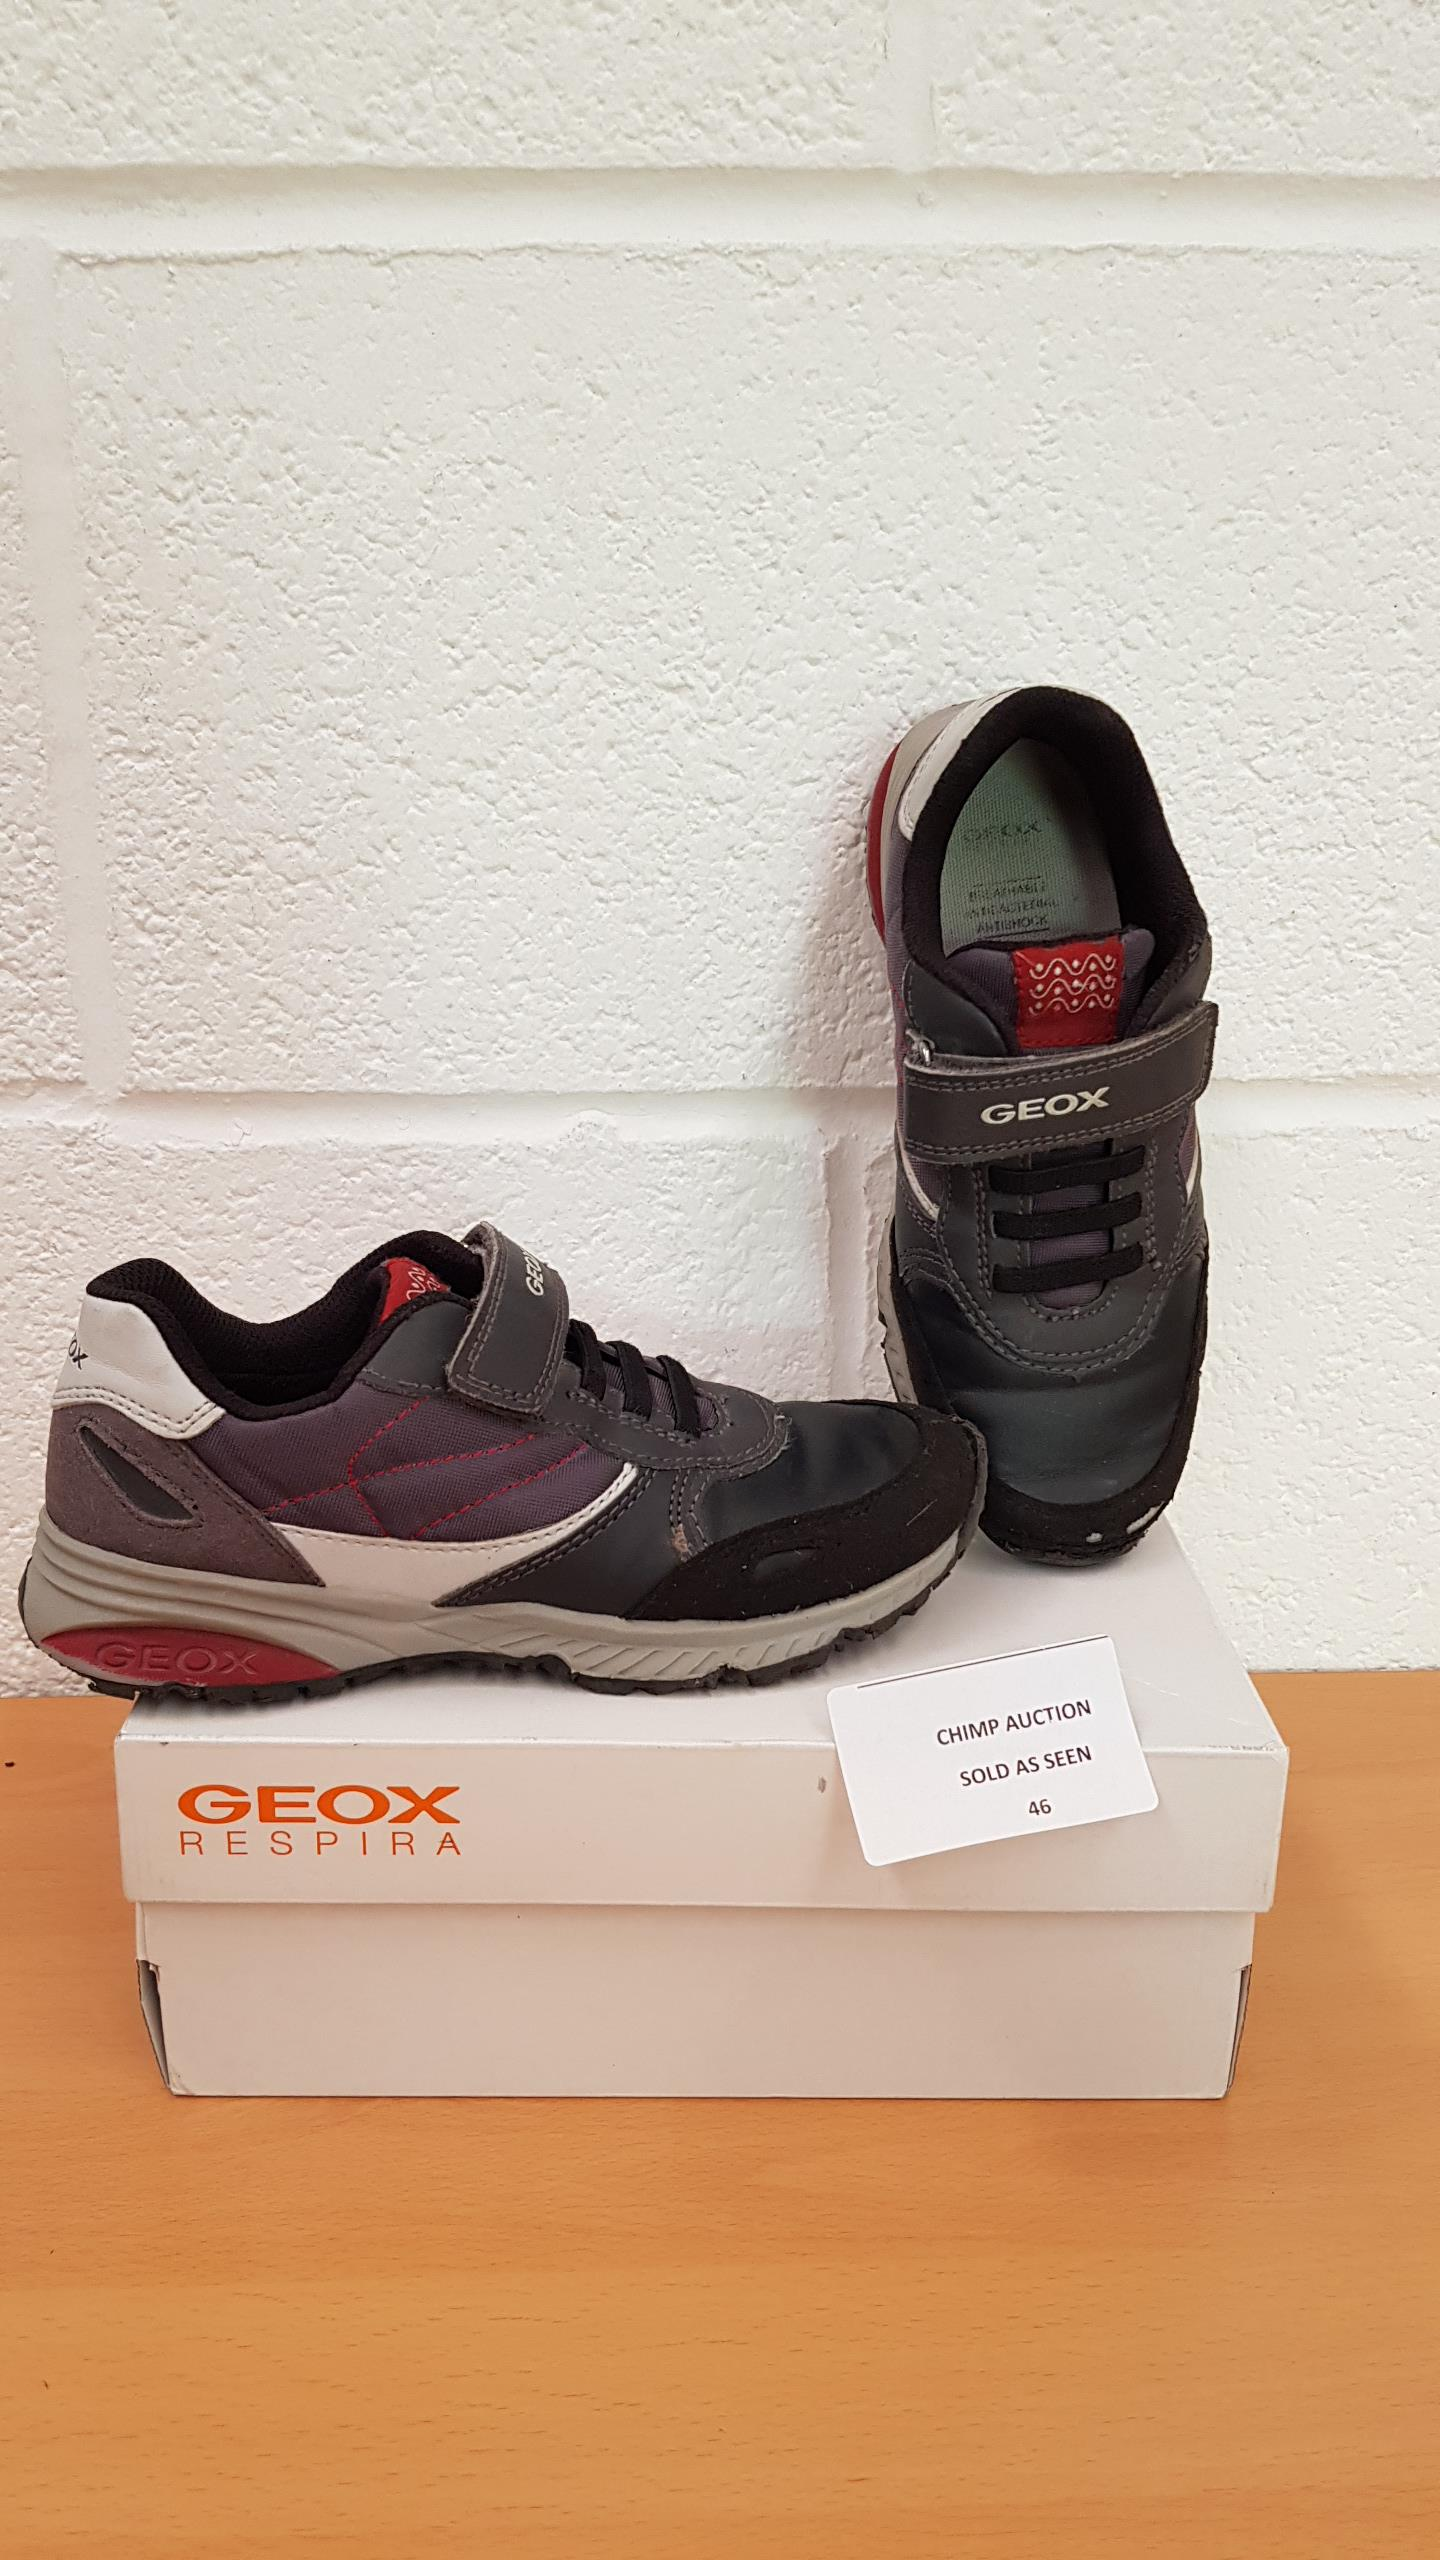 Lot 46 - Geox Respira kids shoes uk size 13